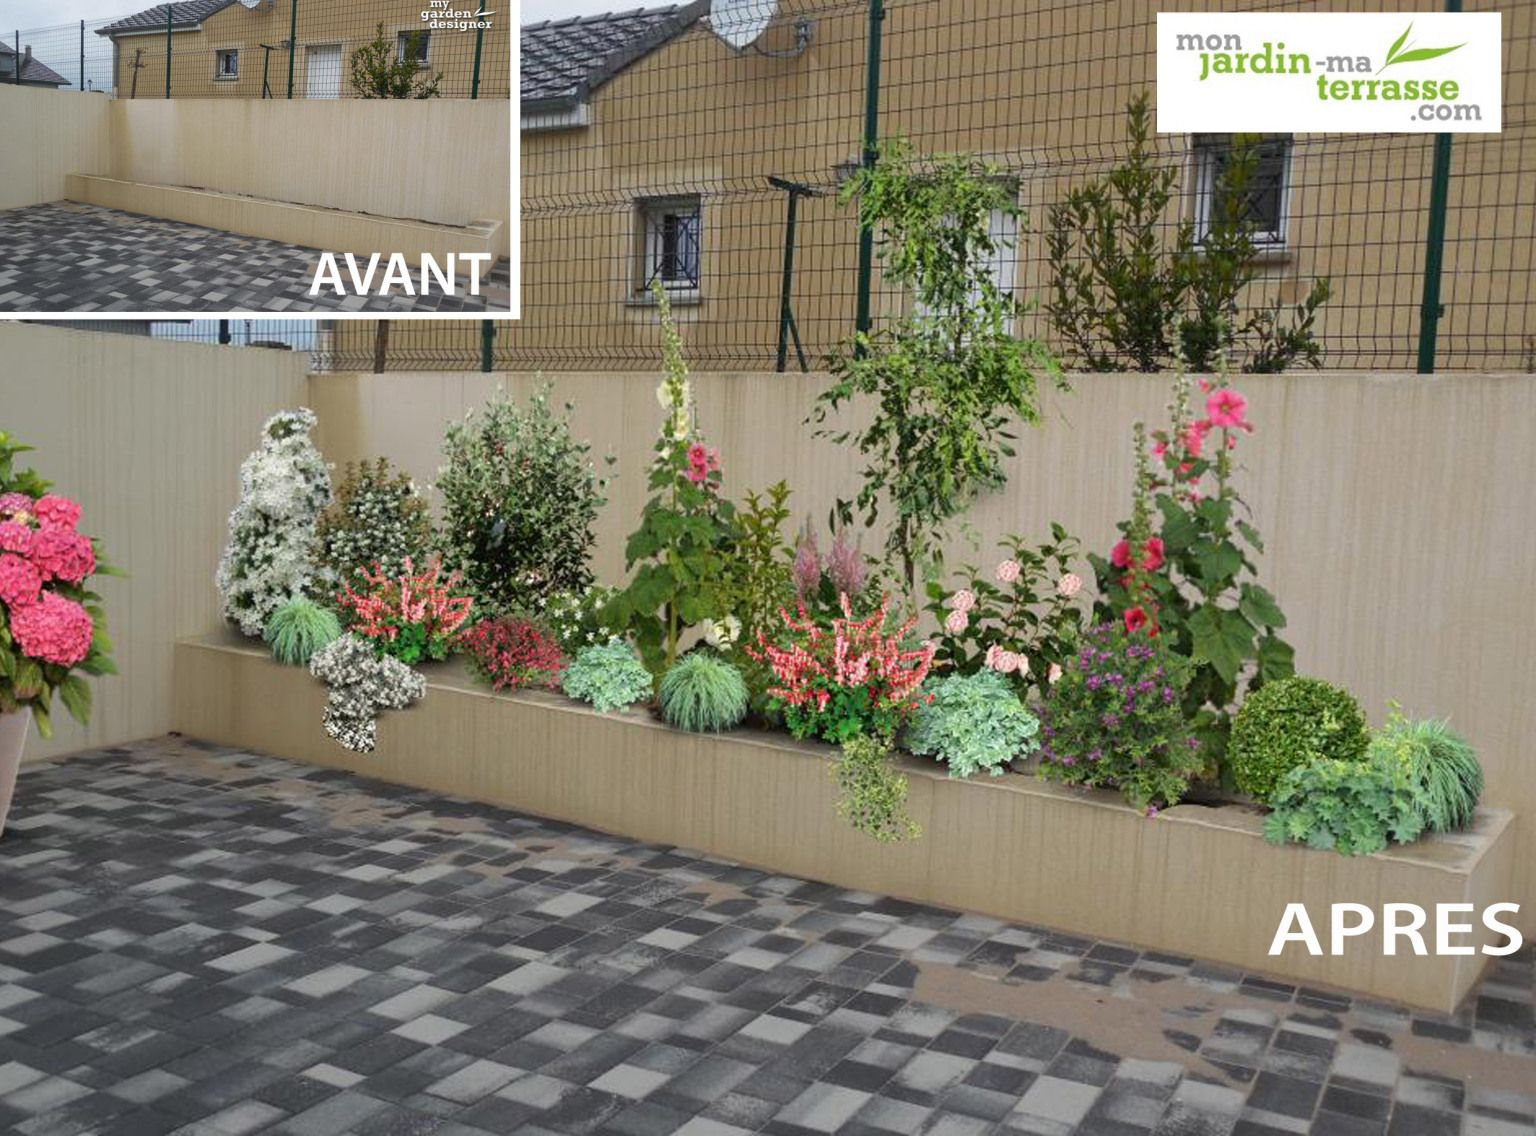 amenagement jardiniere terrasse terrasse balcon. Black Bedroom Furniture Sets. Home Design Ideas